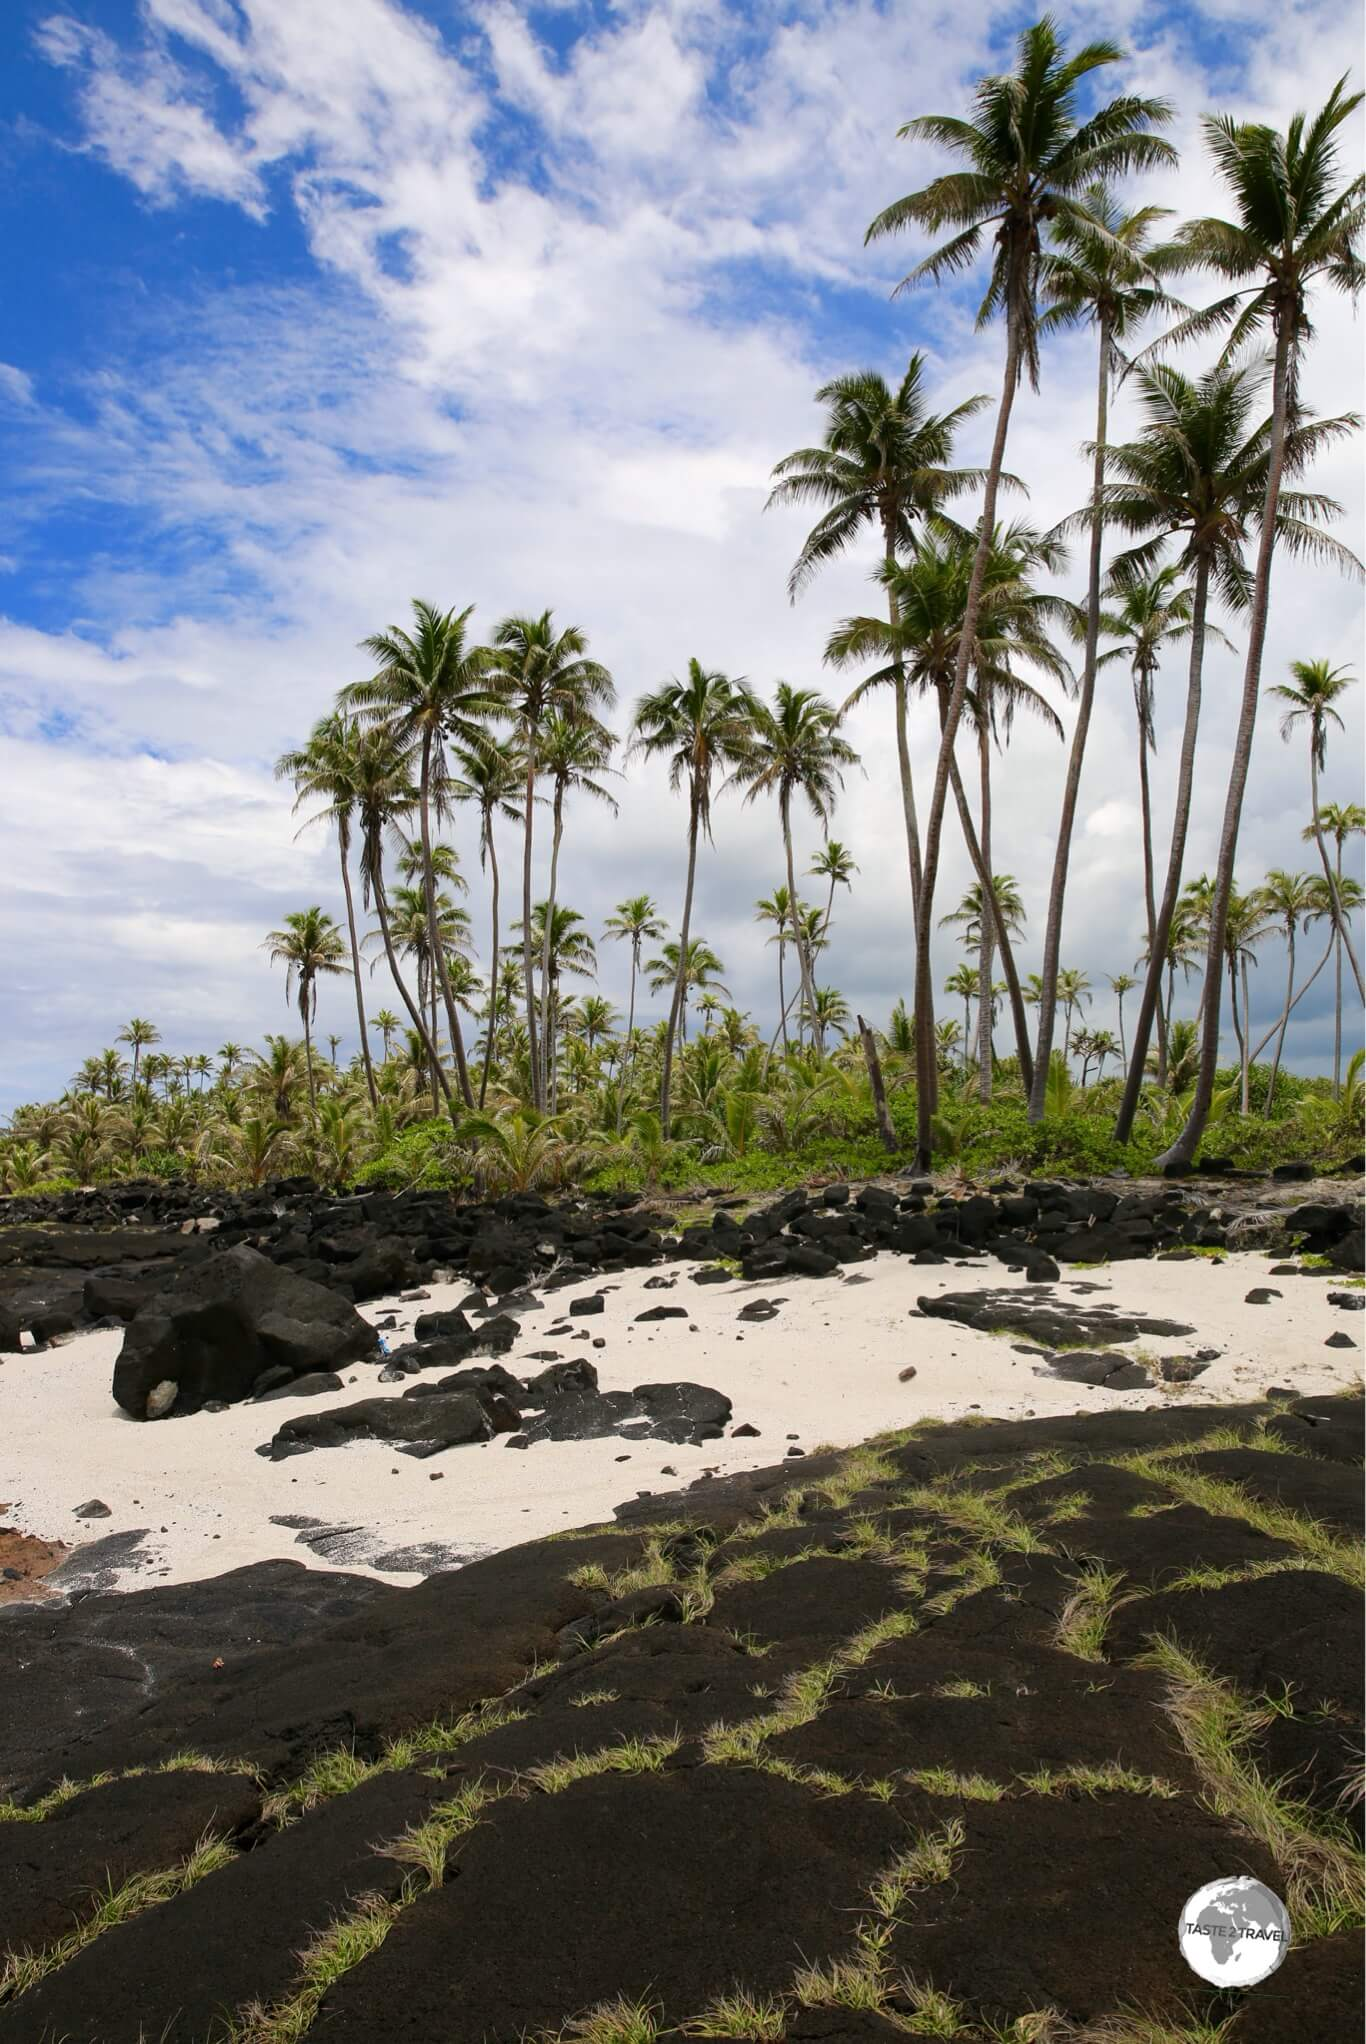 Ancient lava flows cover the beach around the Alofaaga blowholes.